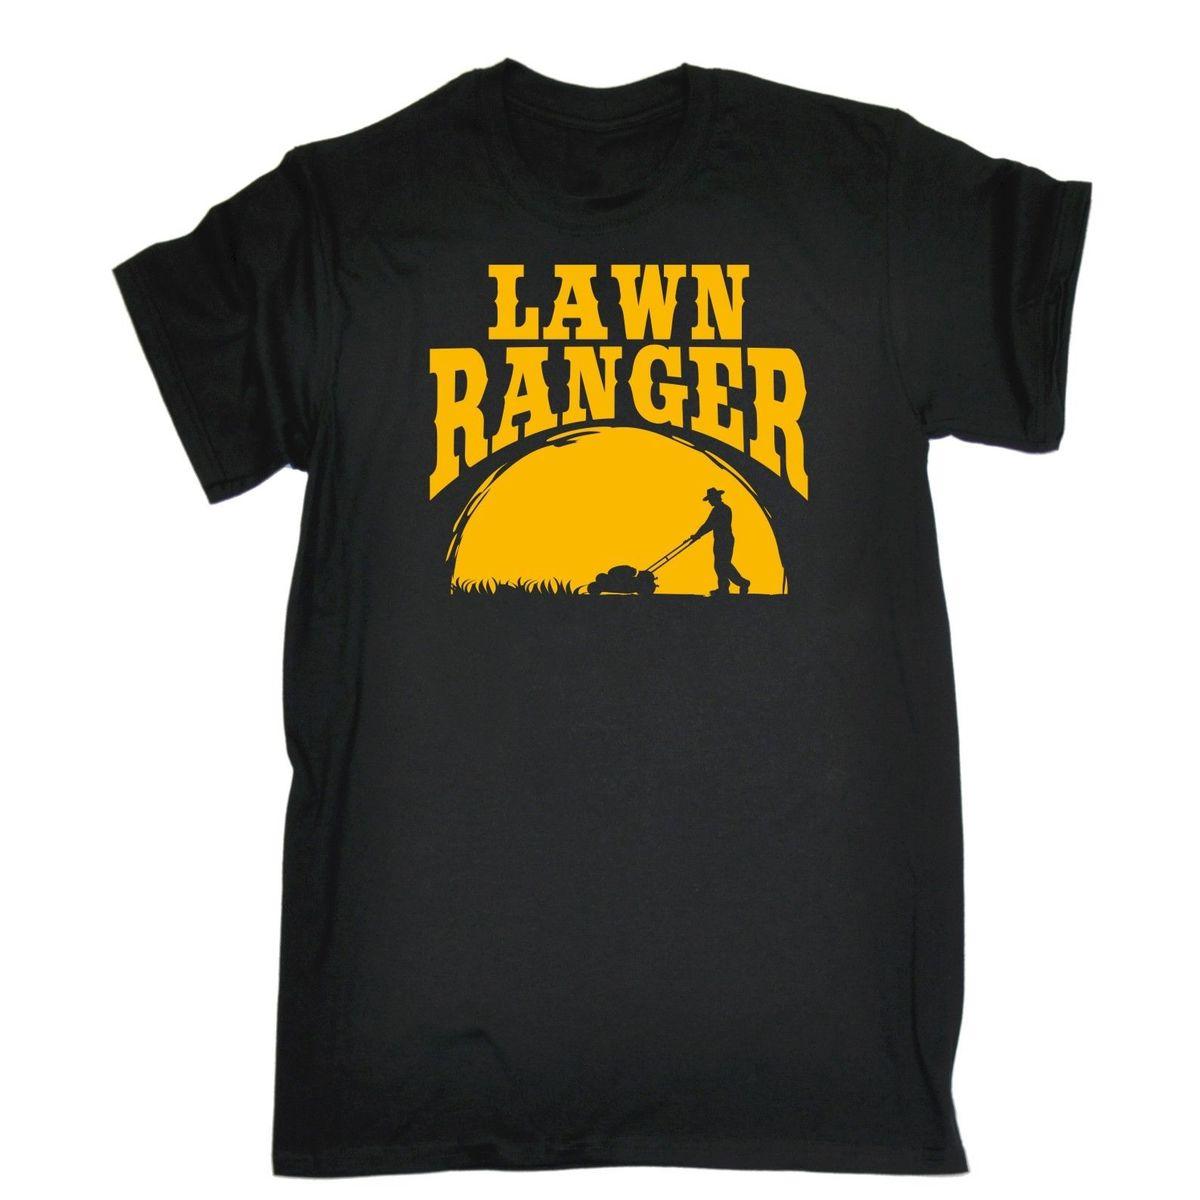 Shop Rangers Shirts UK | Rangers Shirts free delivery to UK